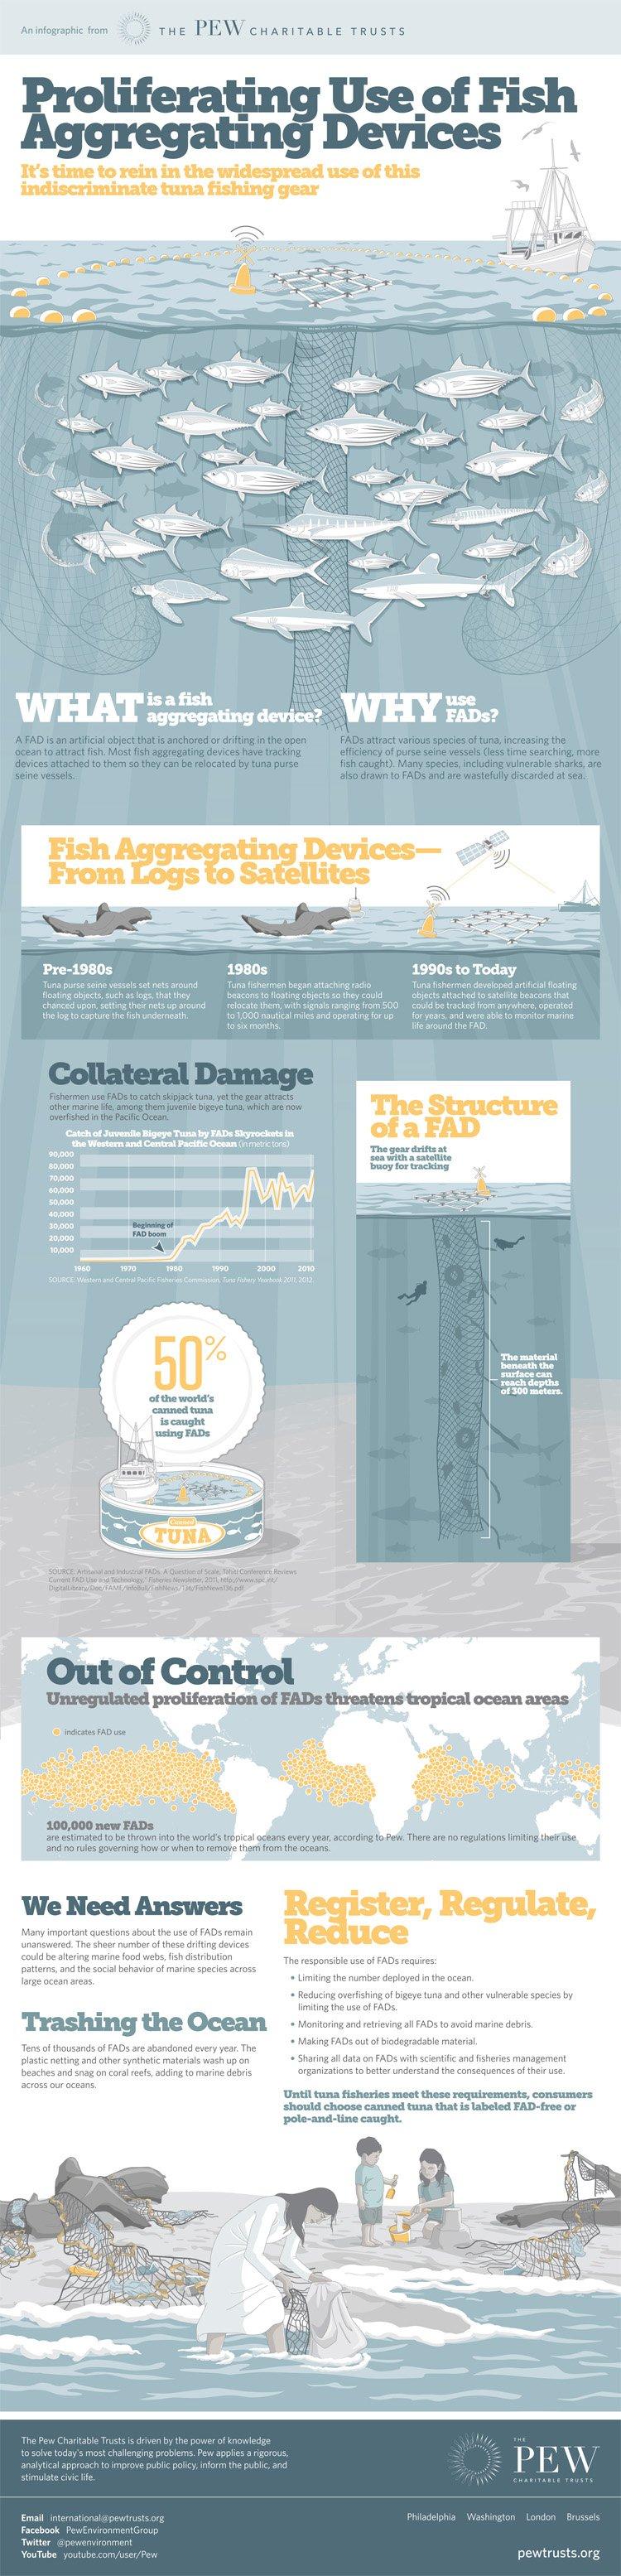 PEW tuna FAD infographic